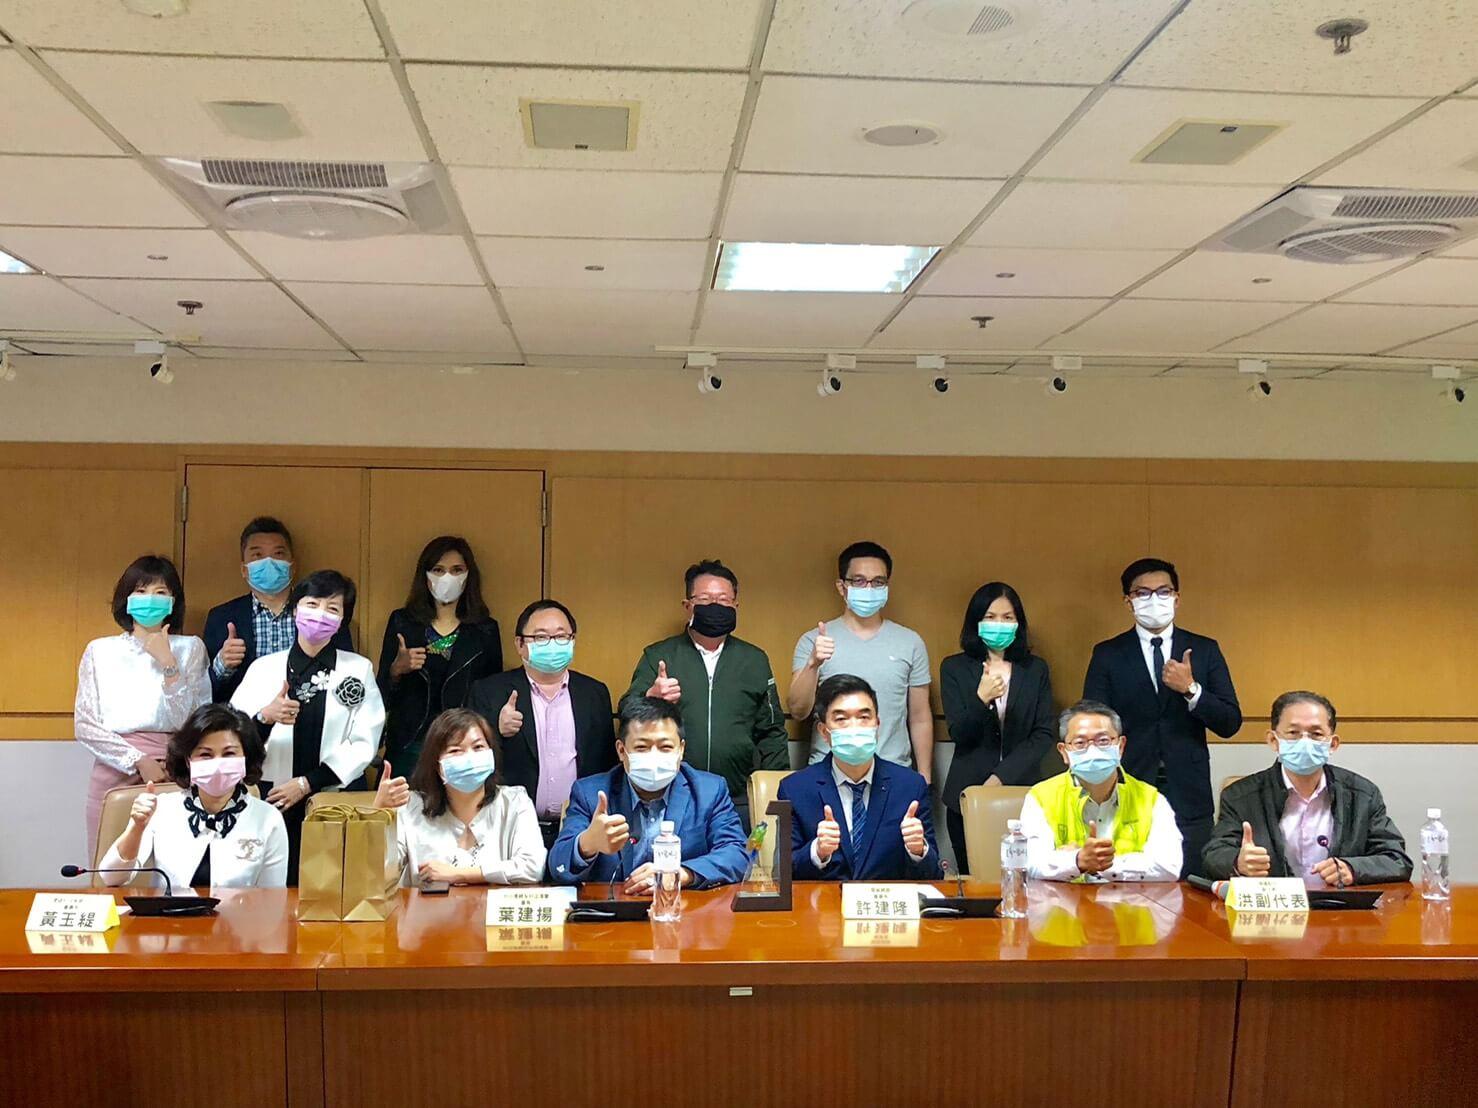 20-0410-【台日產業參訪】-台湾マクス代表チーム-關貿網路公司